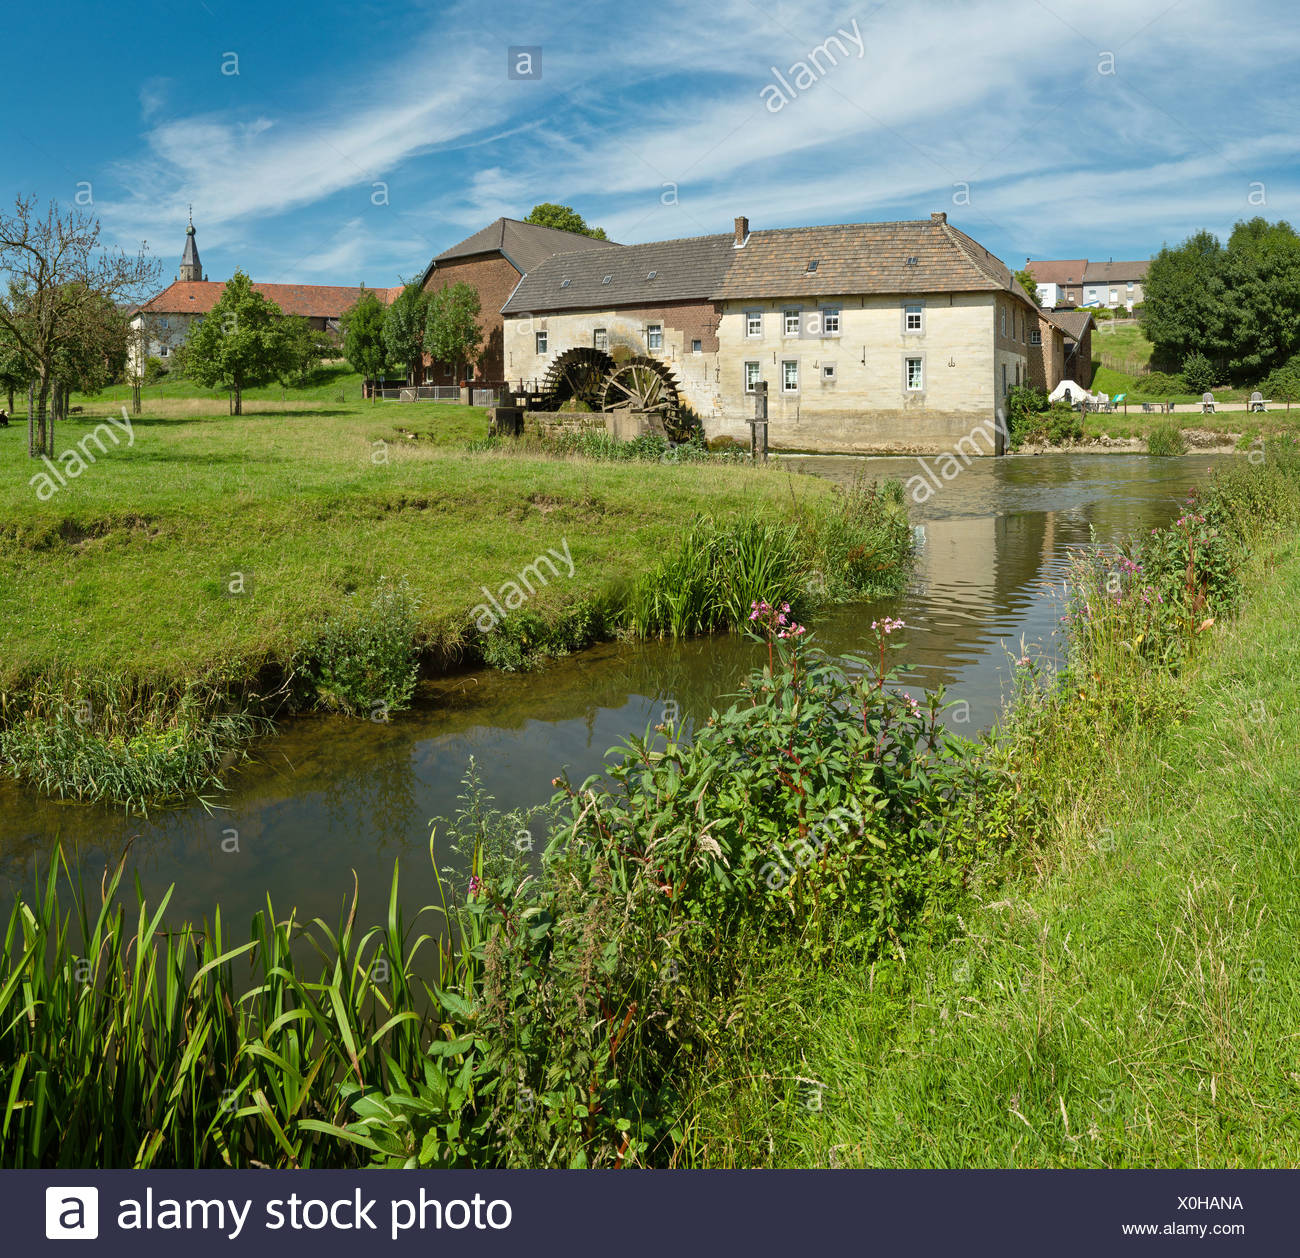 Netherlands, Holland, Europe, Wijlre, Water wheel mill, Water wheel, windmill, water, flowers, summer, - Stock Image